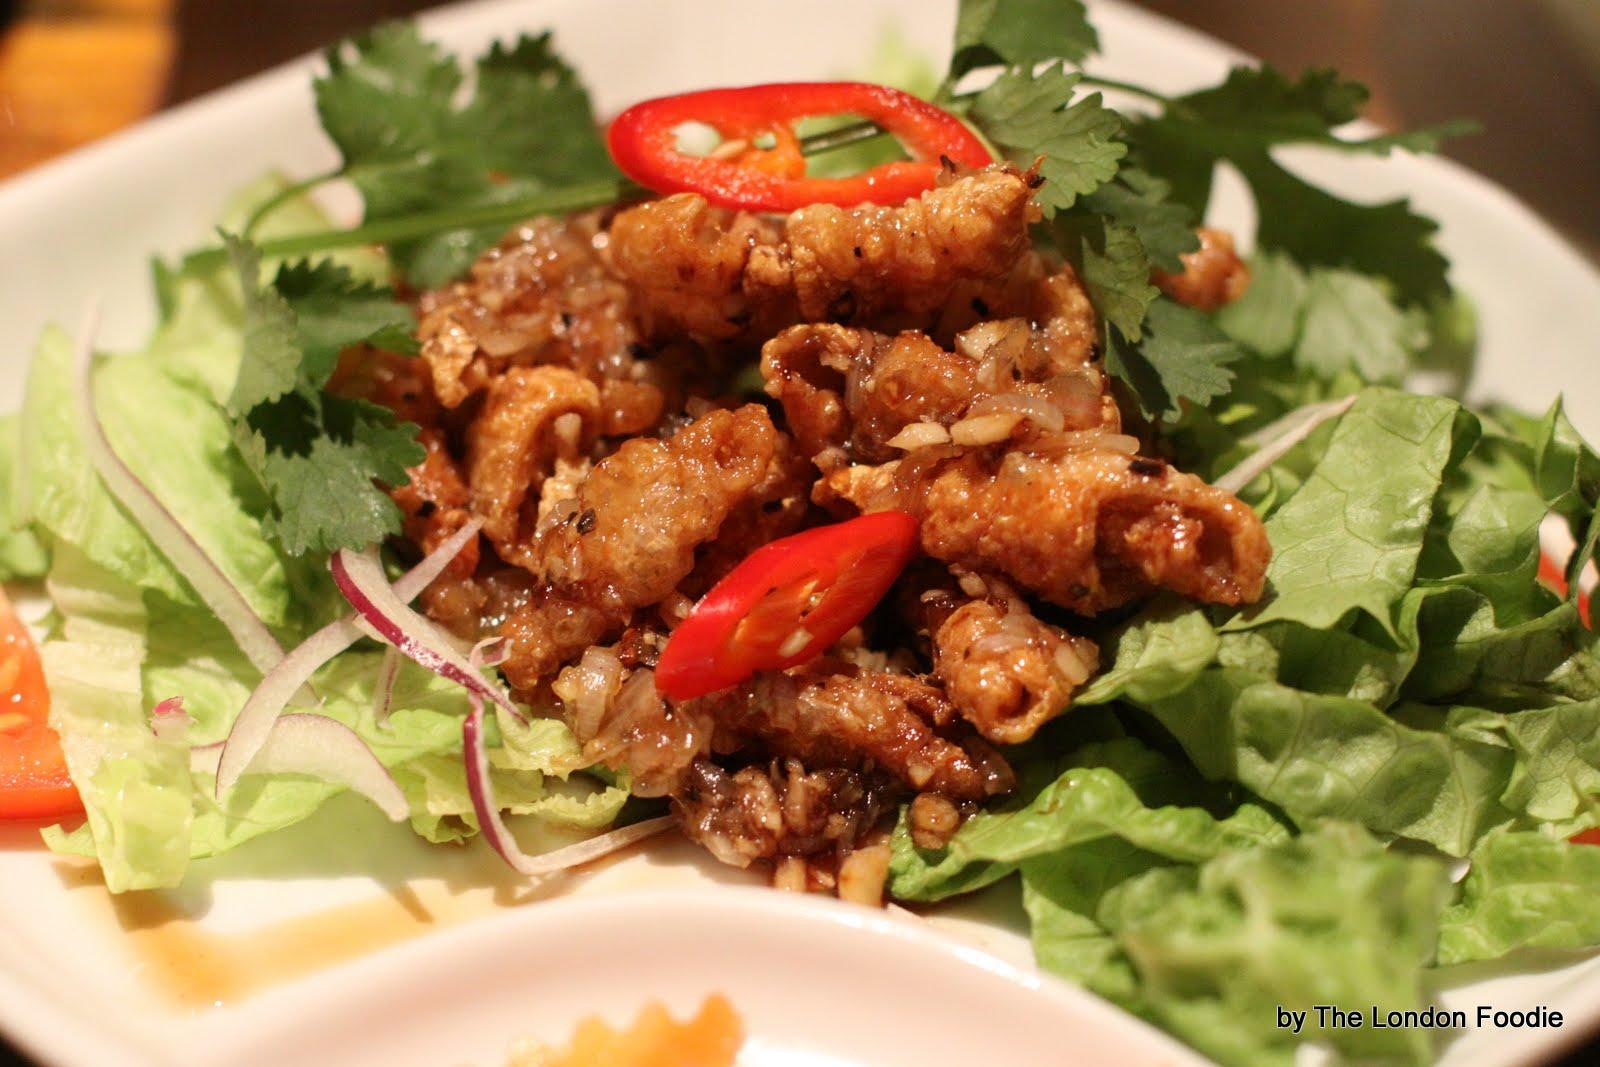 The London Foodie London Restaurant Reviews Mien Tay Kingsland Road